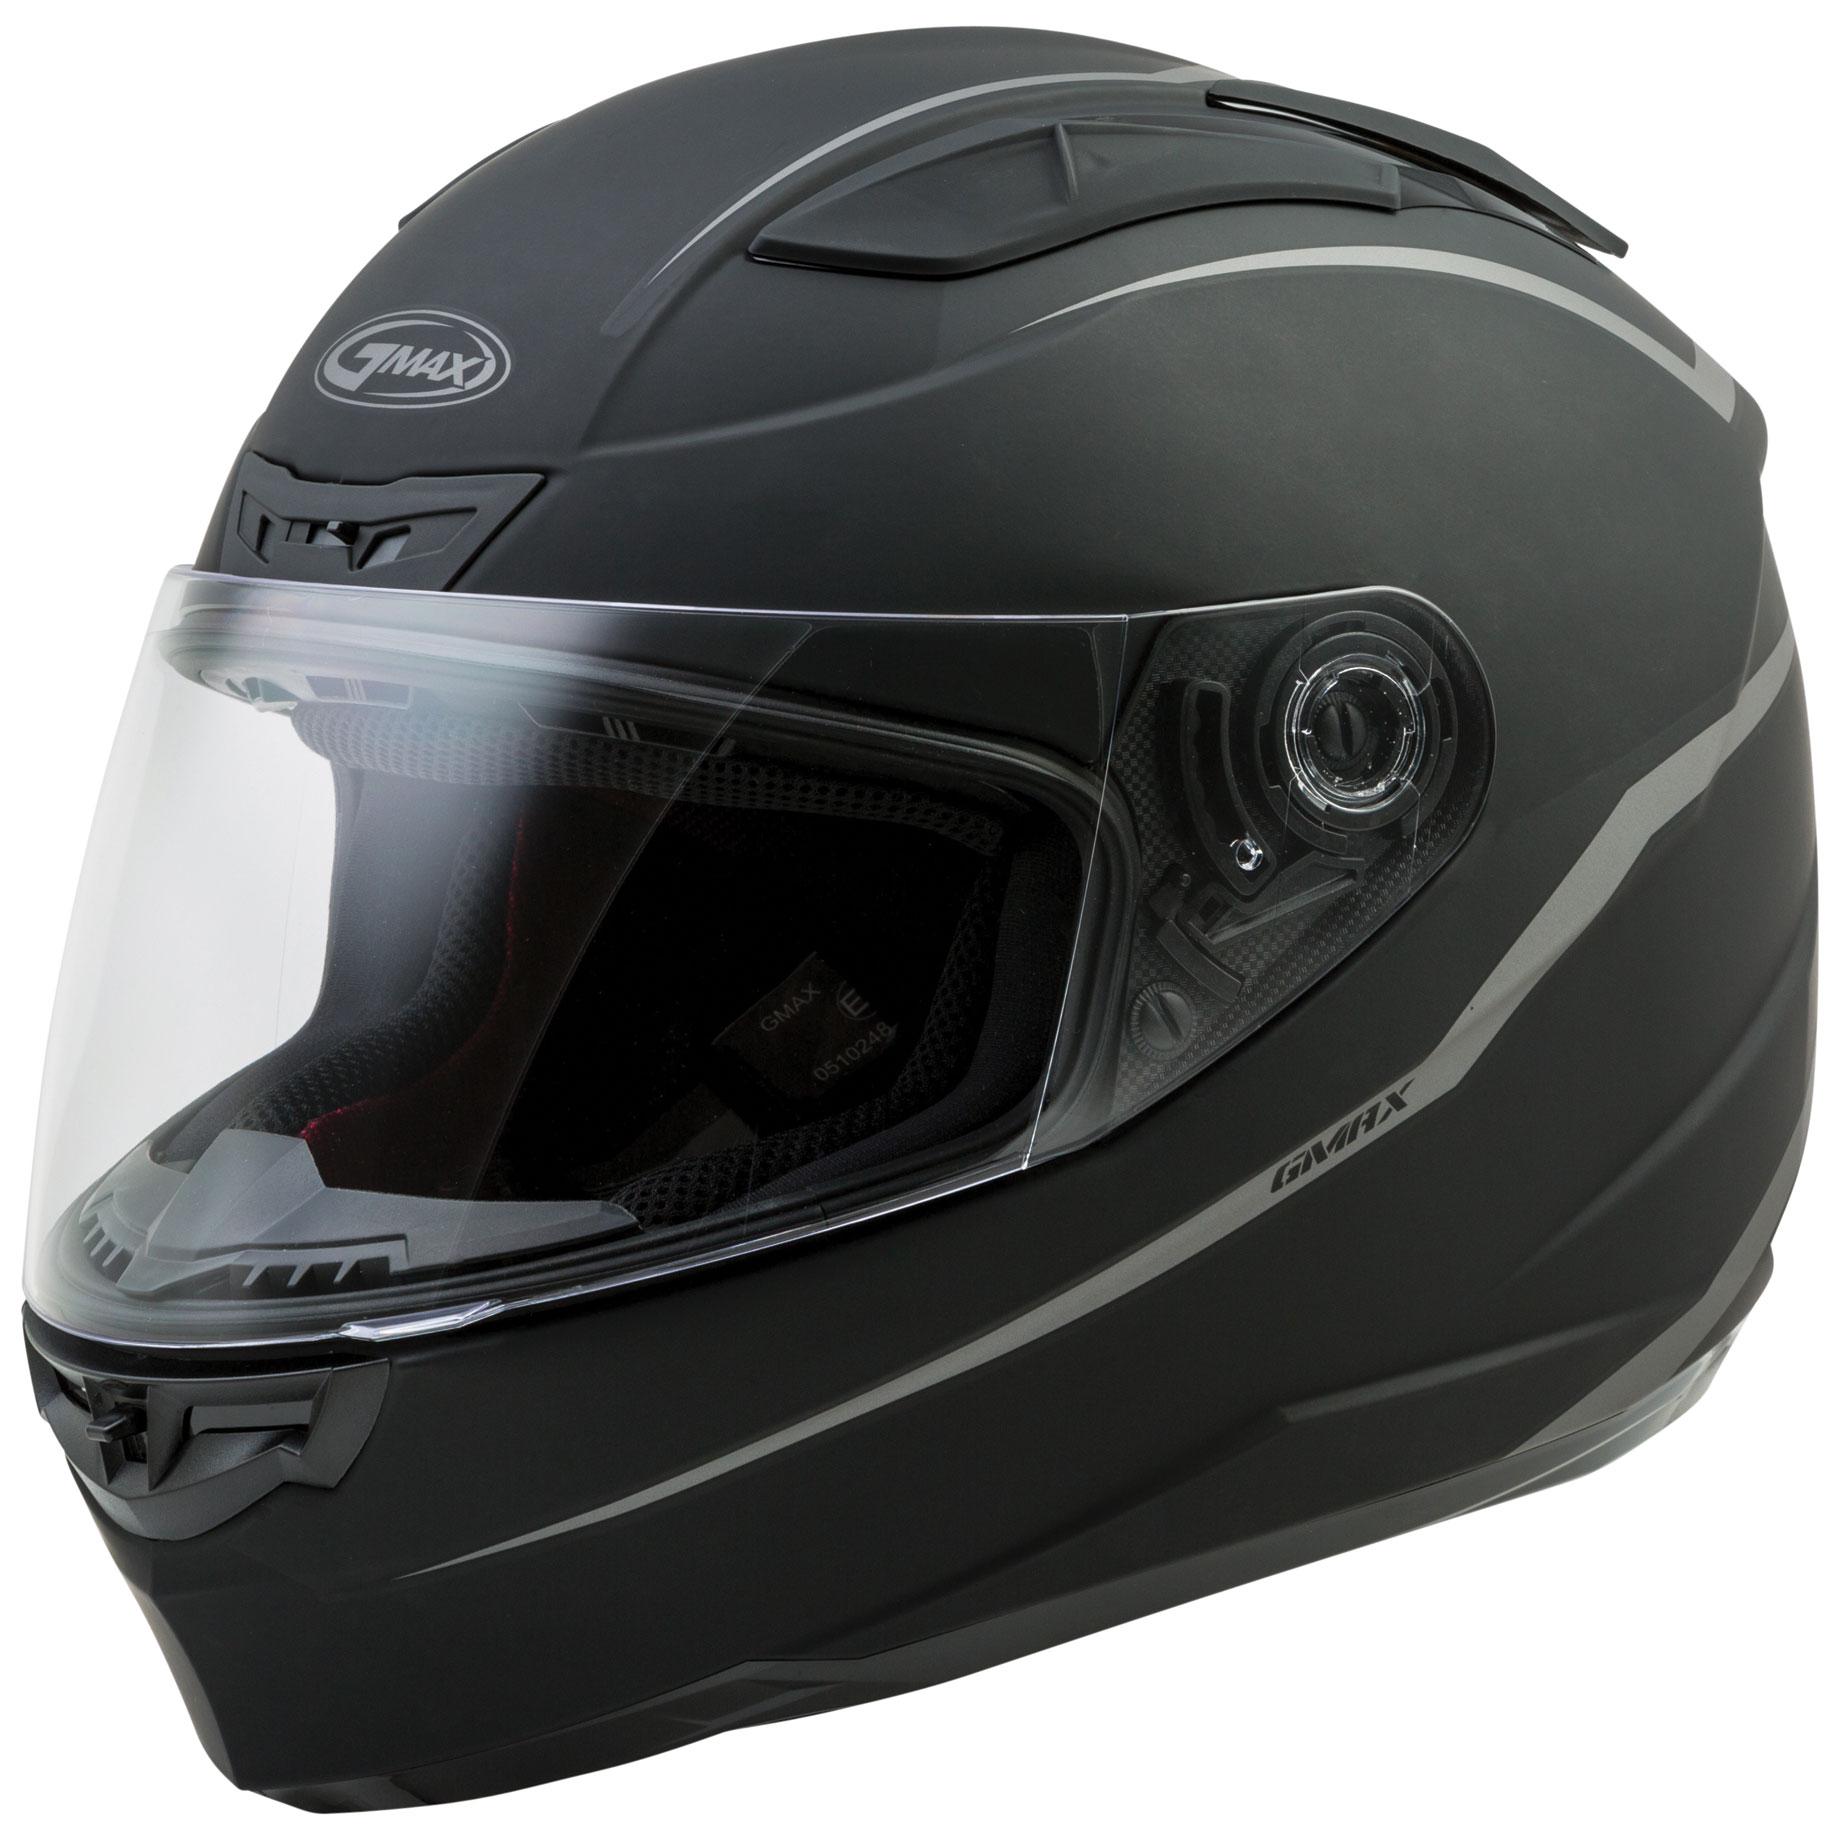 GMAX FF-88 Precept Matte Black Full Face Helmet